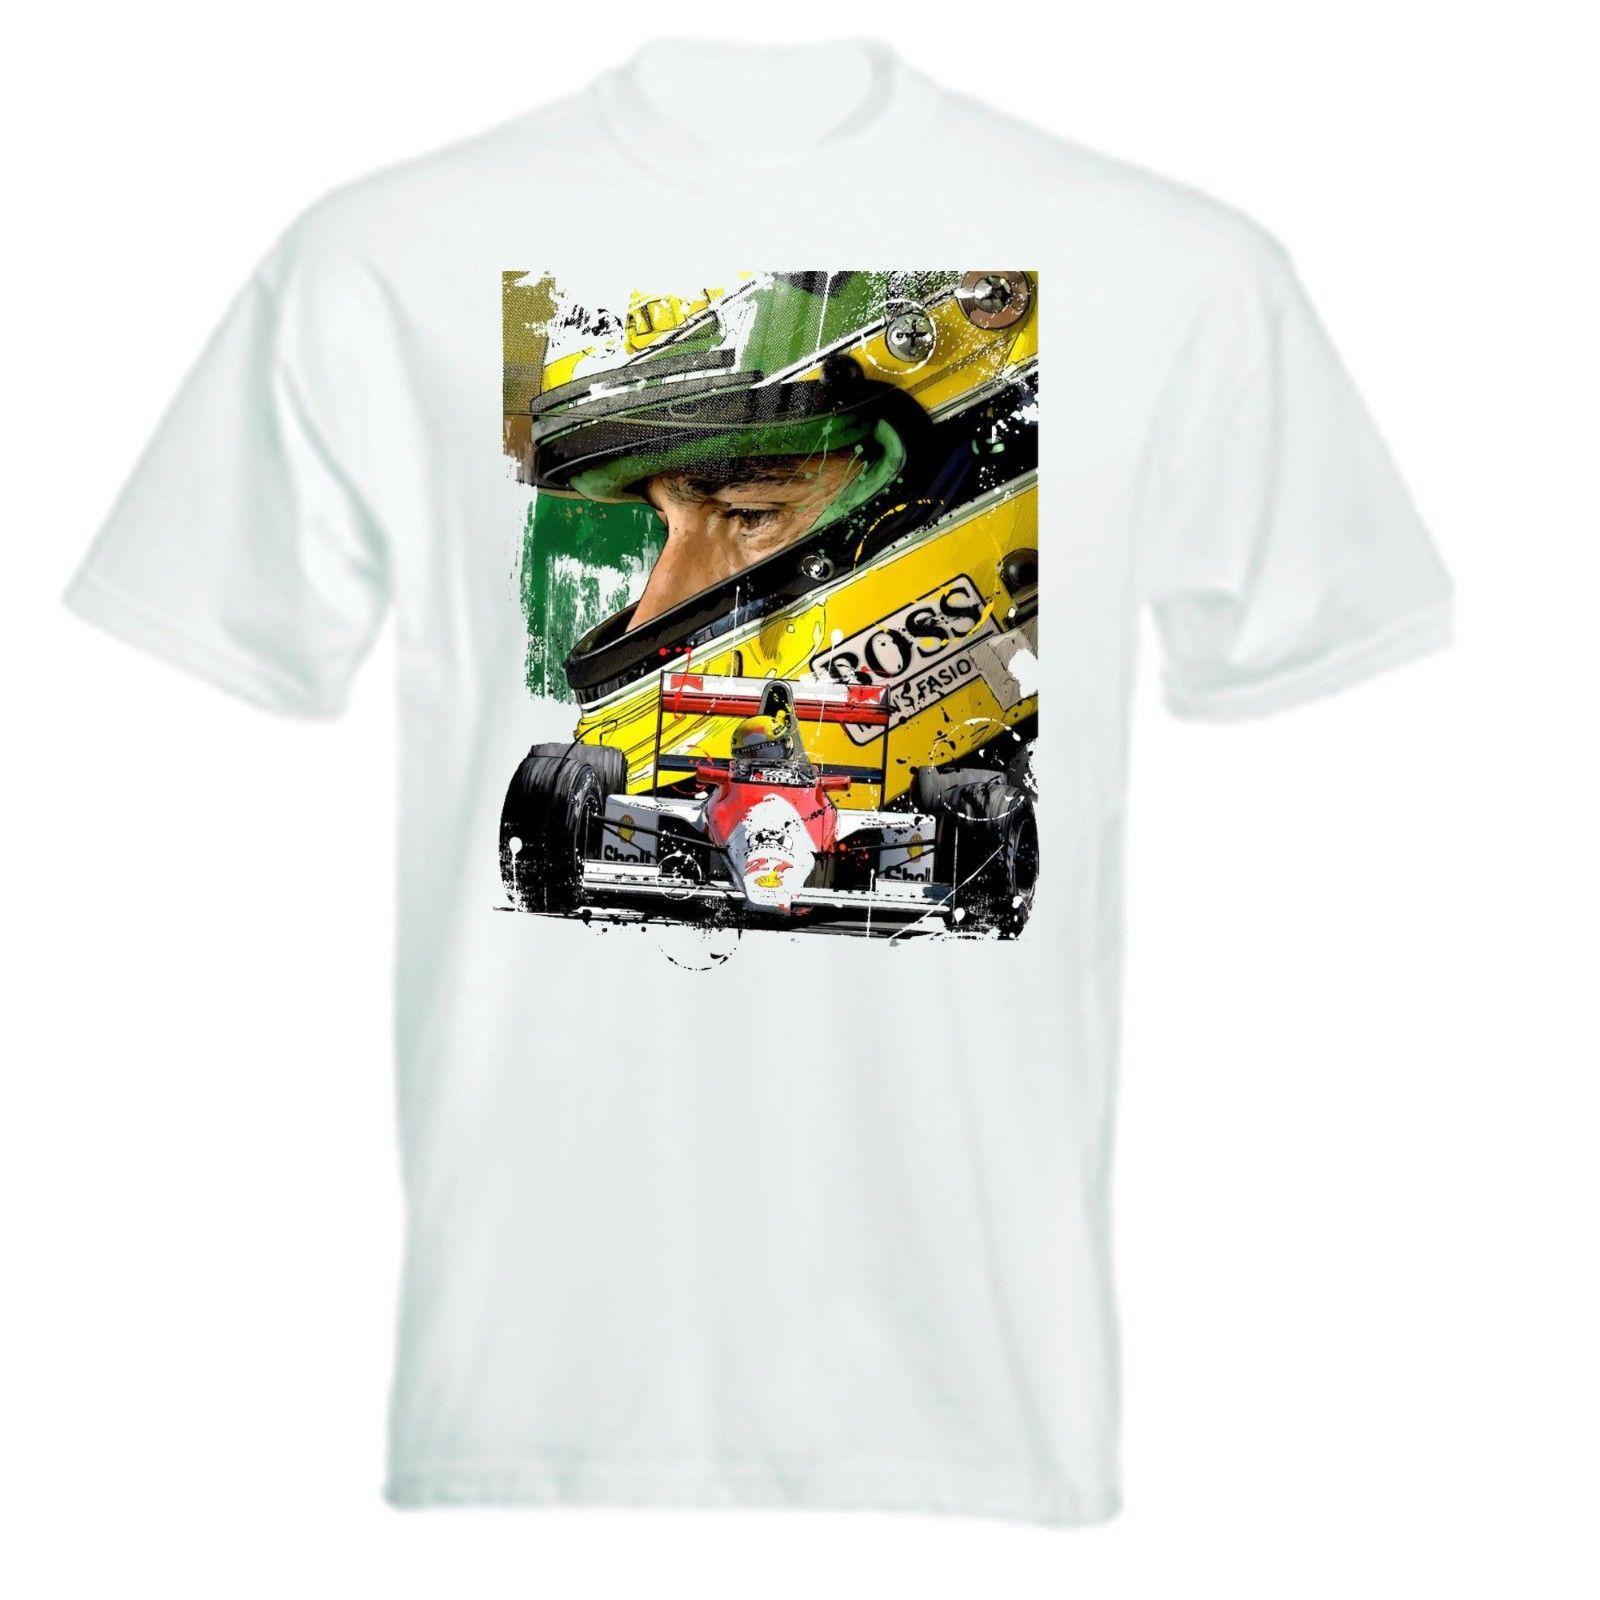 ayrton-font-b-senna-b-font-orgulho-arte-t-camisa-casual-cool-t-shirt-homens-unisex-nova-moda-camiseta-tamanho-solta-top-ajax